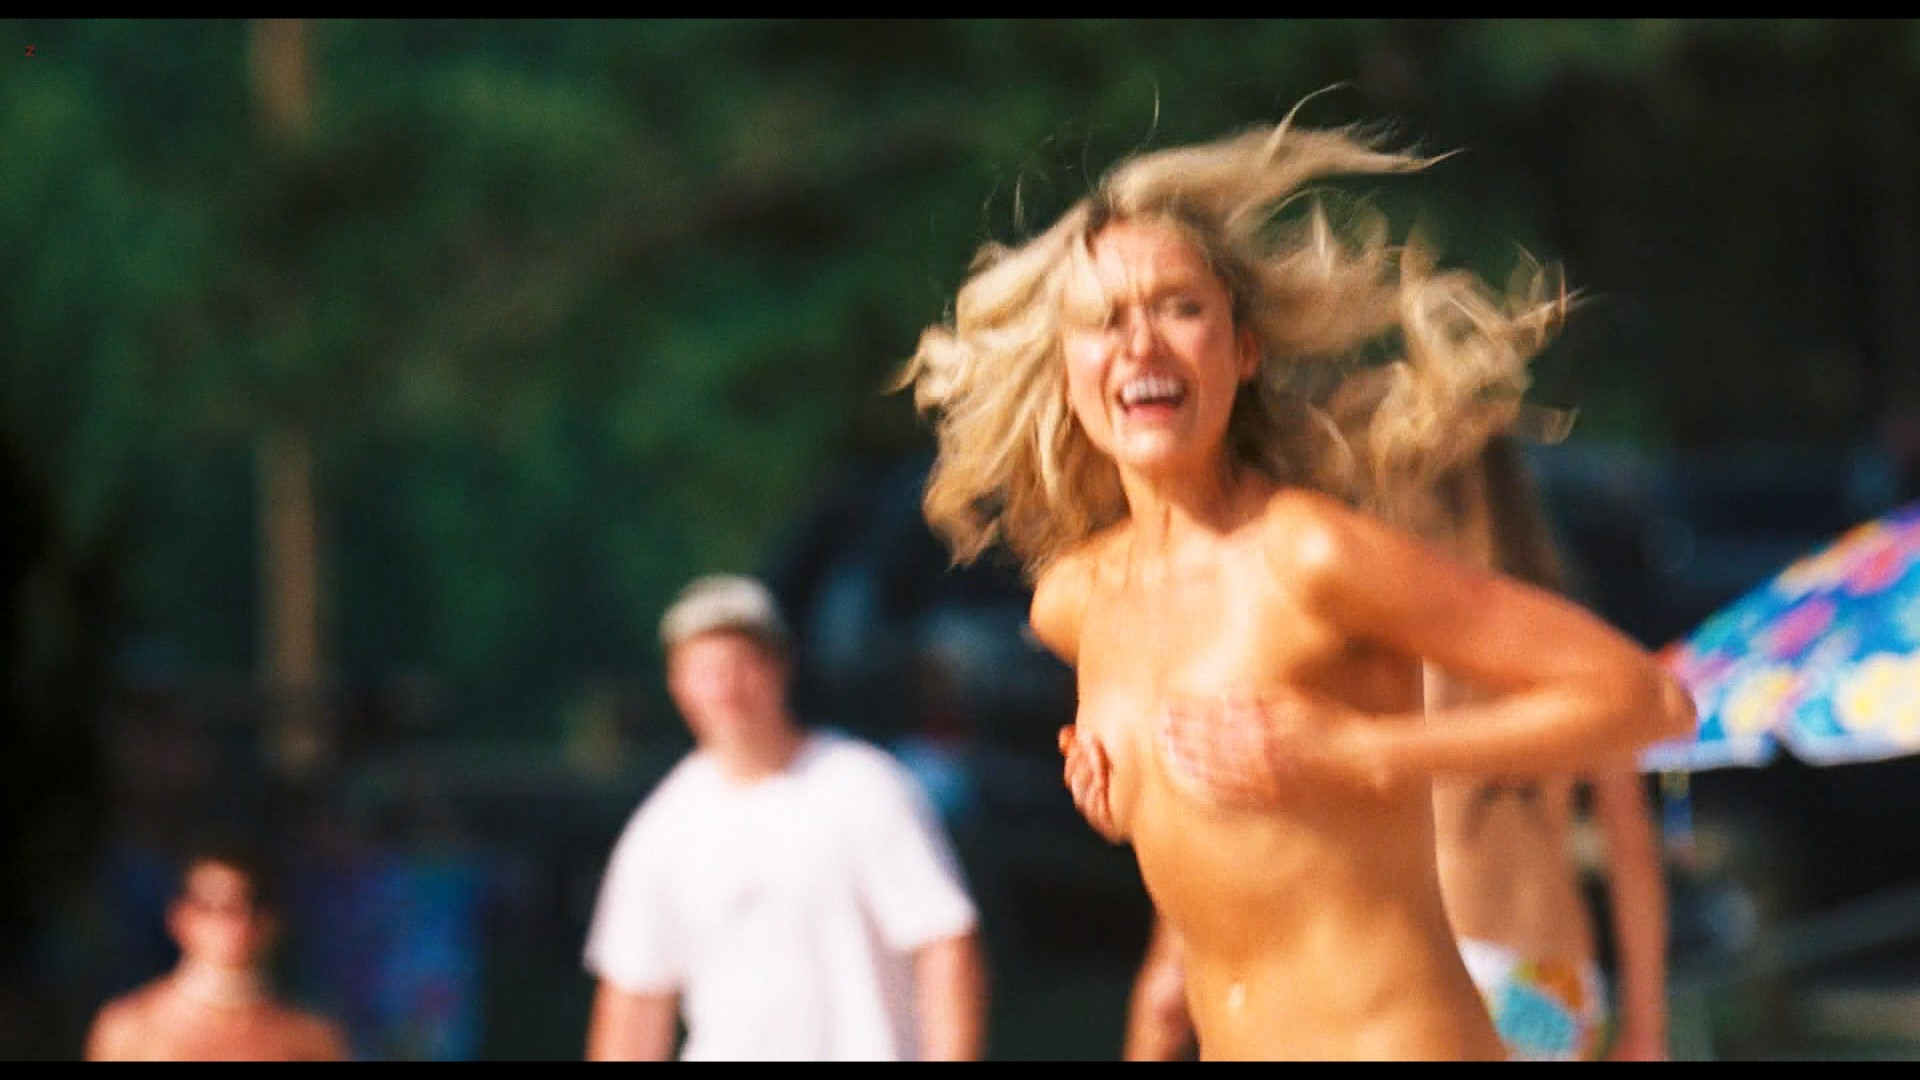 Ali Cobrin Nude Topless Katrina Bowden And Mena Suvari -1540